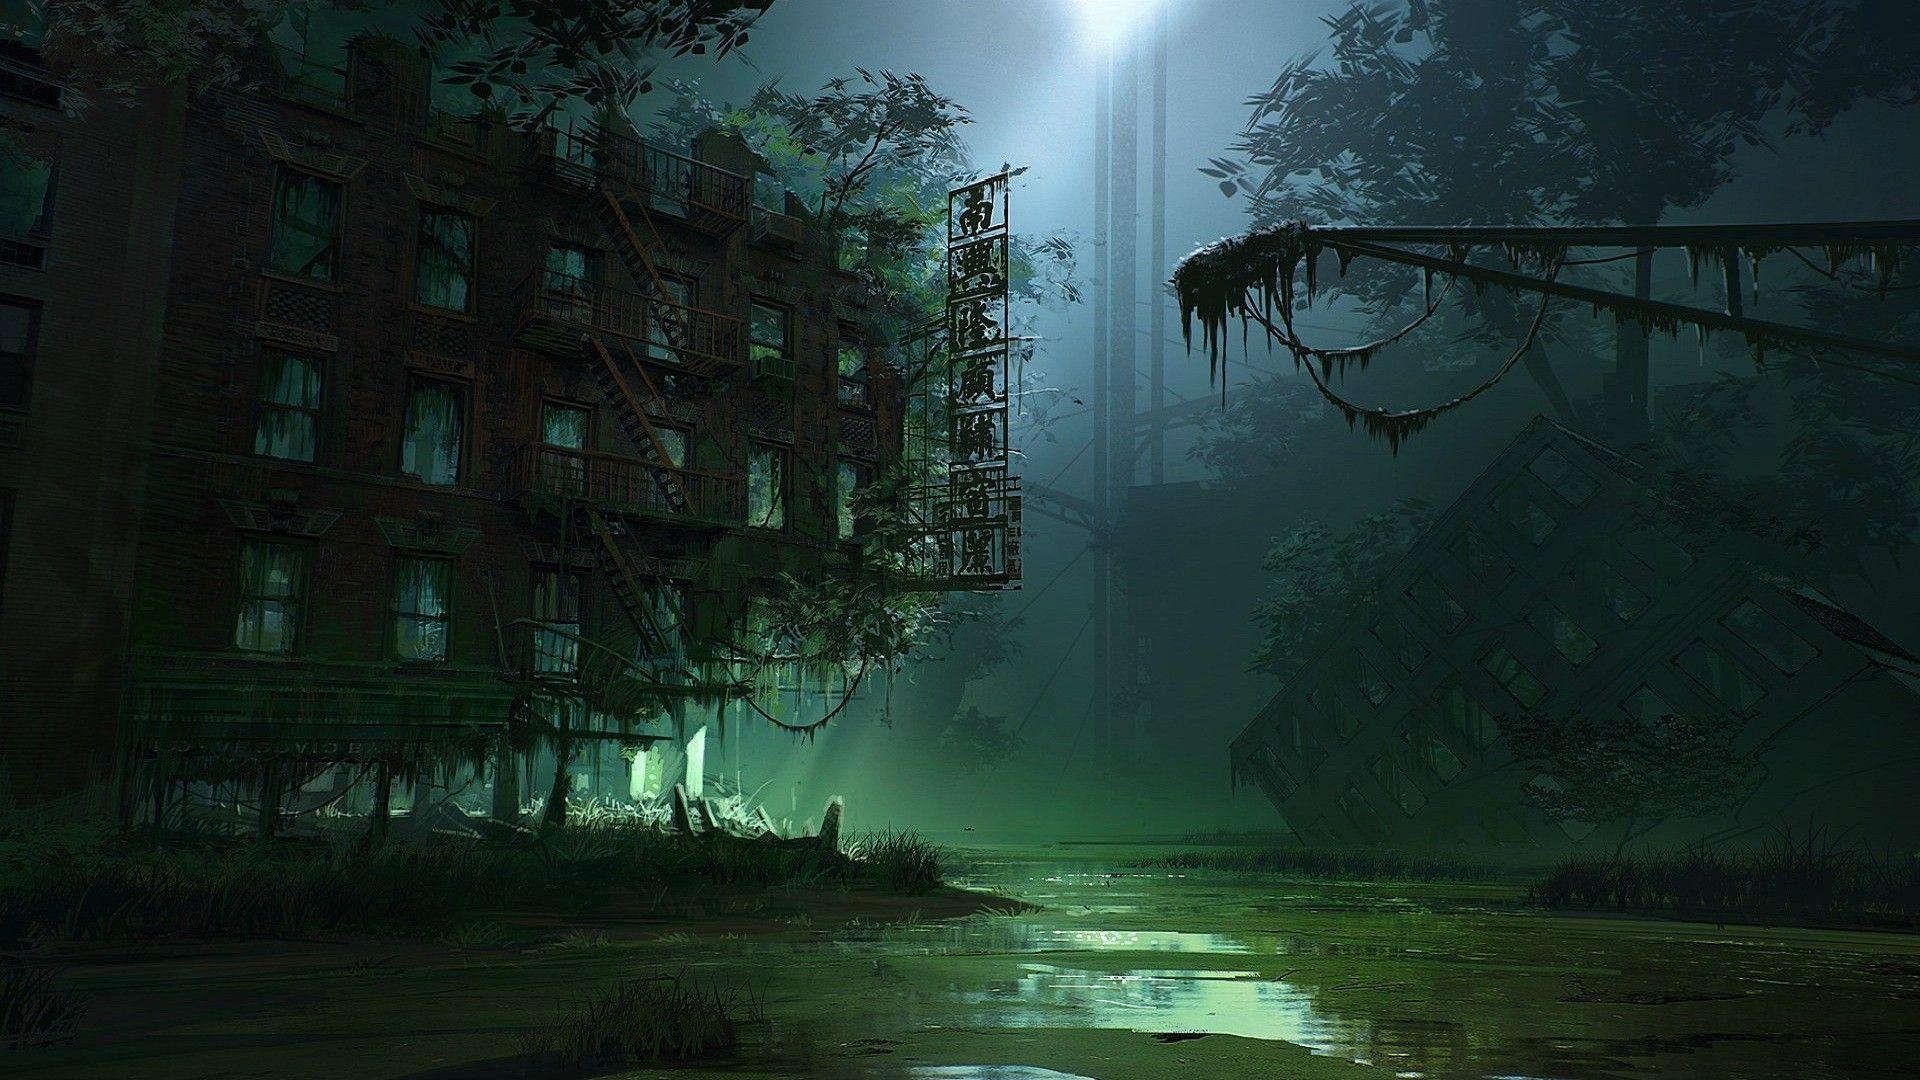 Sci Fi - Post Apocalyptic  Wallpaper